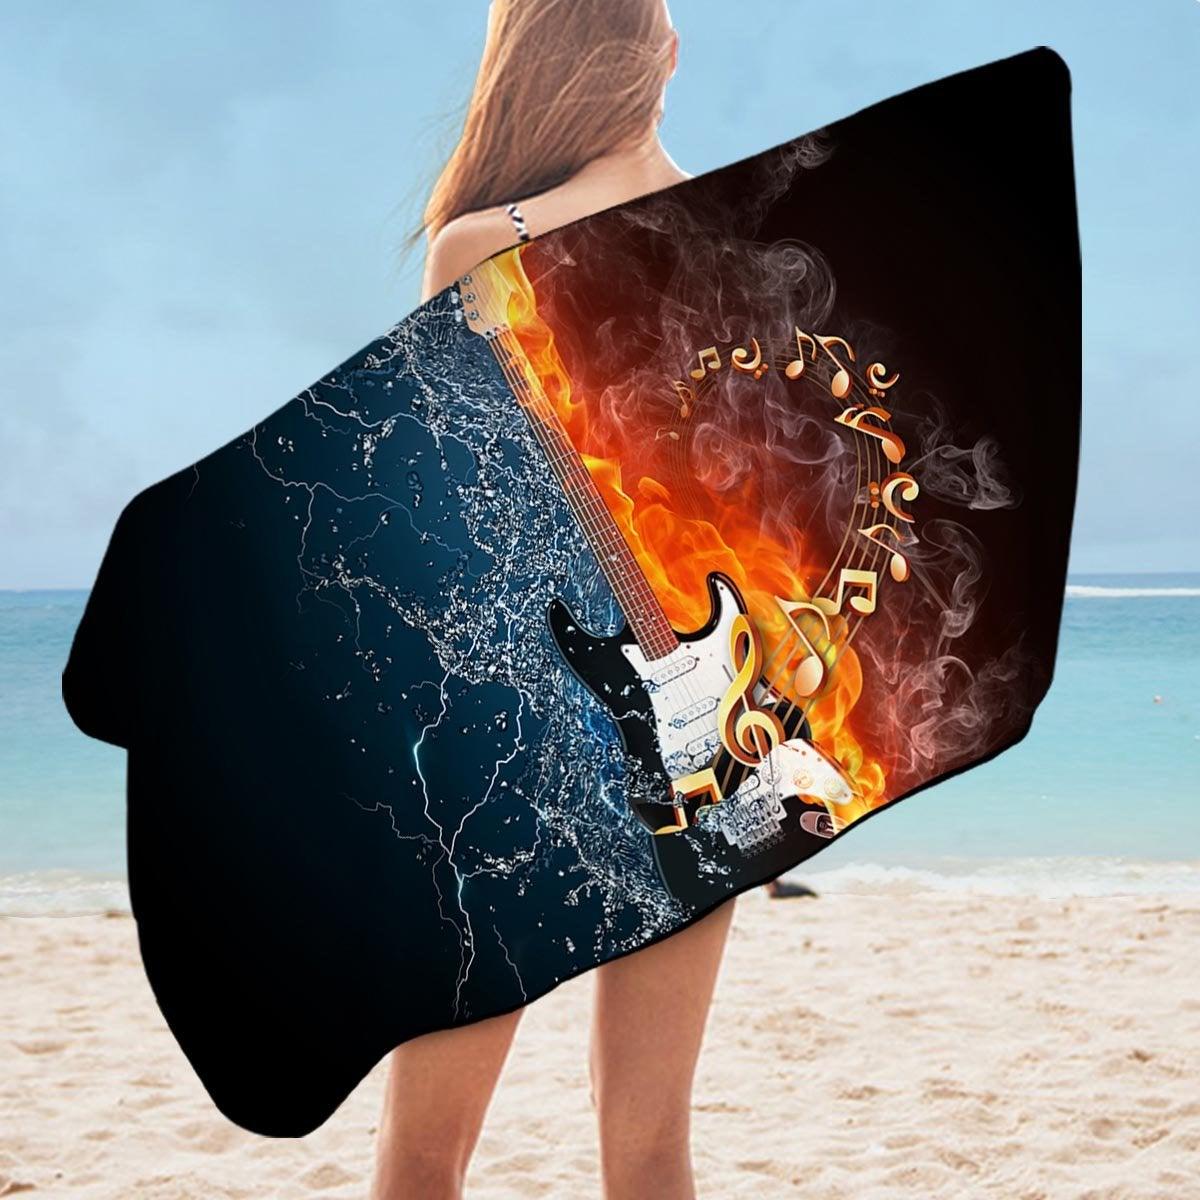 Fire vs Water Electric Guitar Microfiber Beach Towel